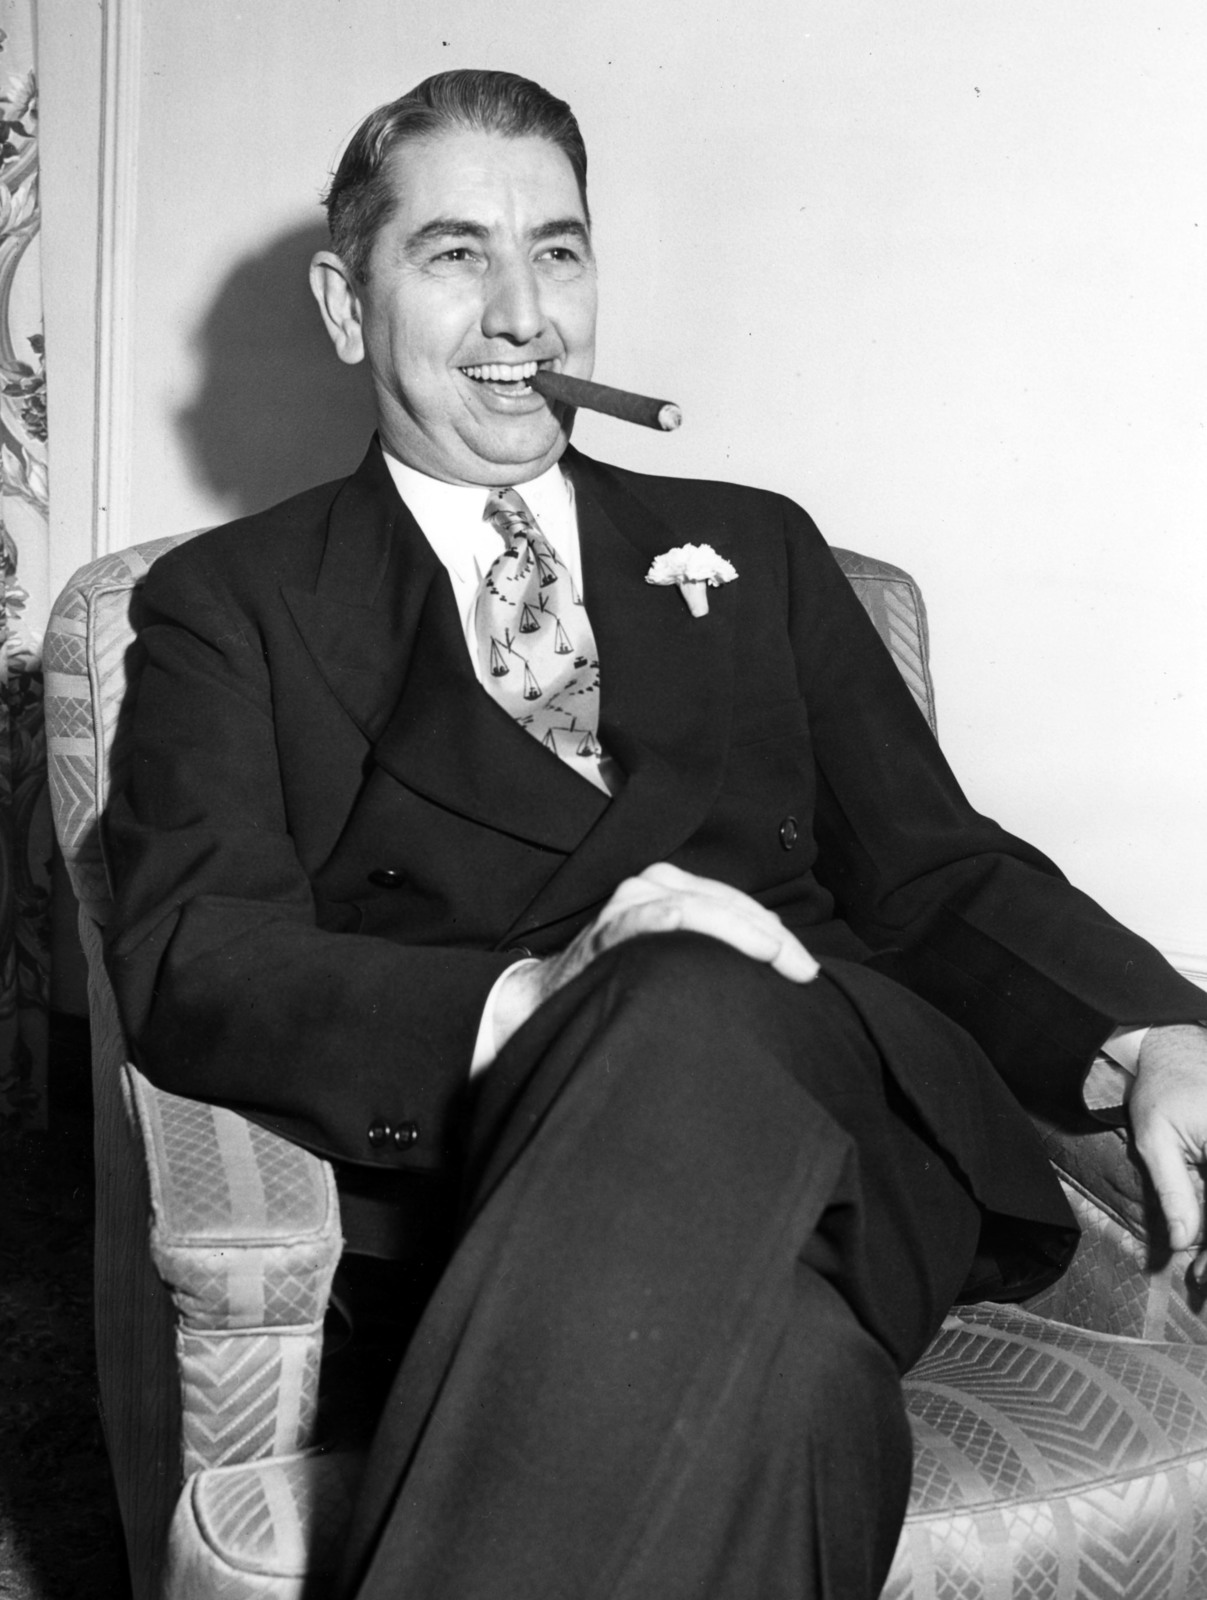 Attorney General Tom C. Clark Seated, Smoking Cigar